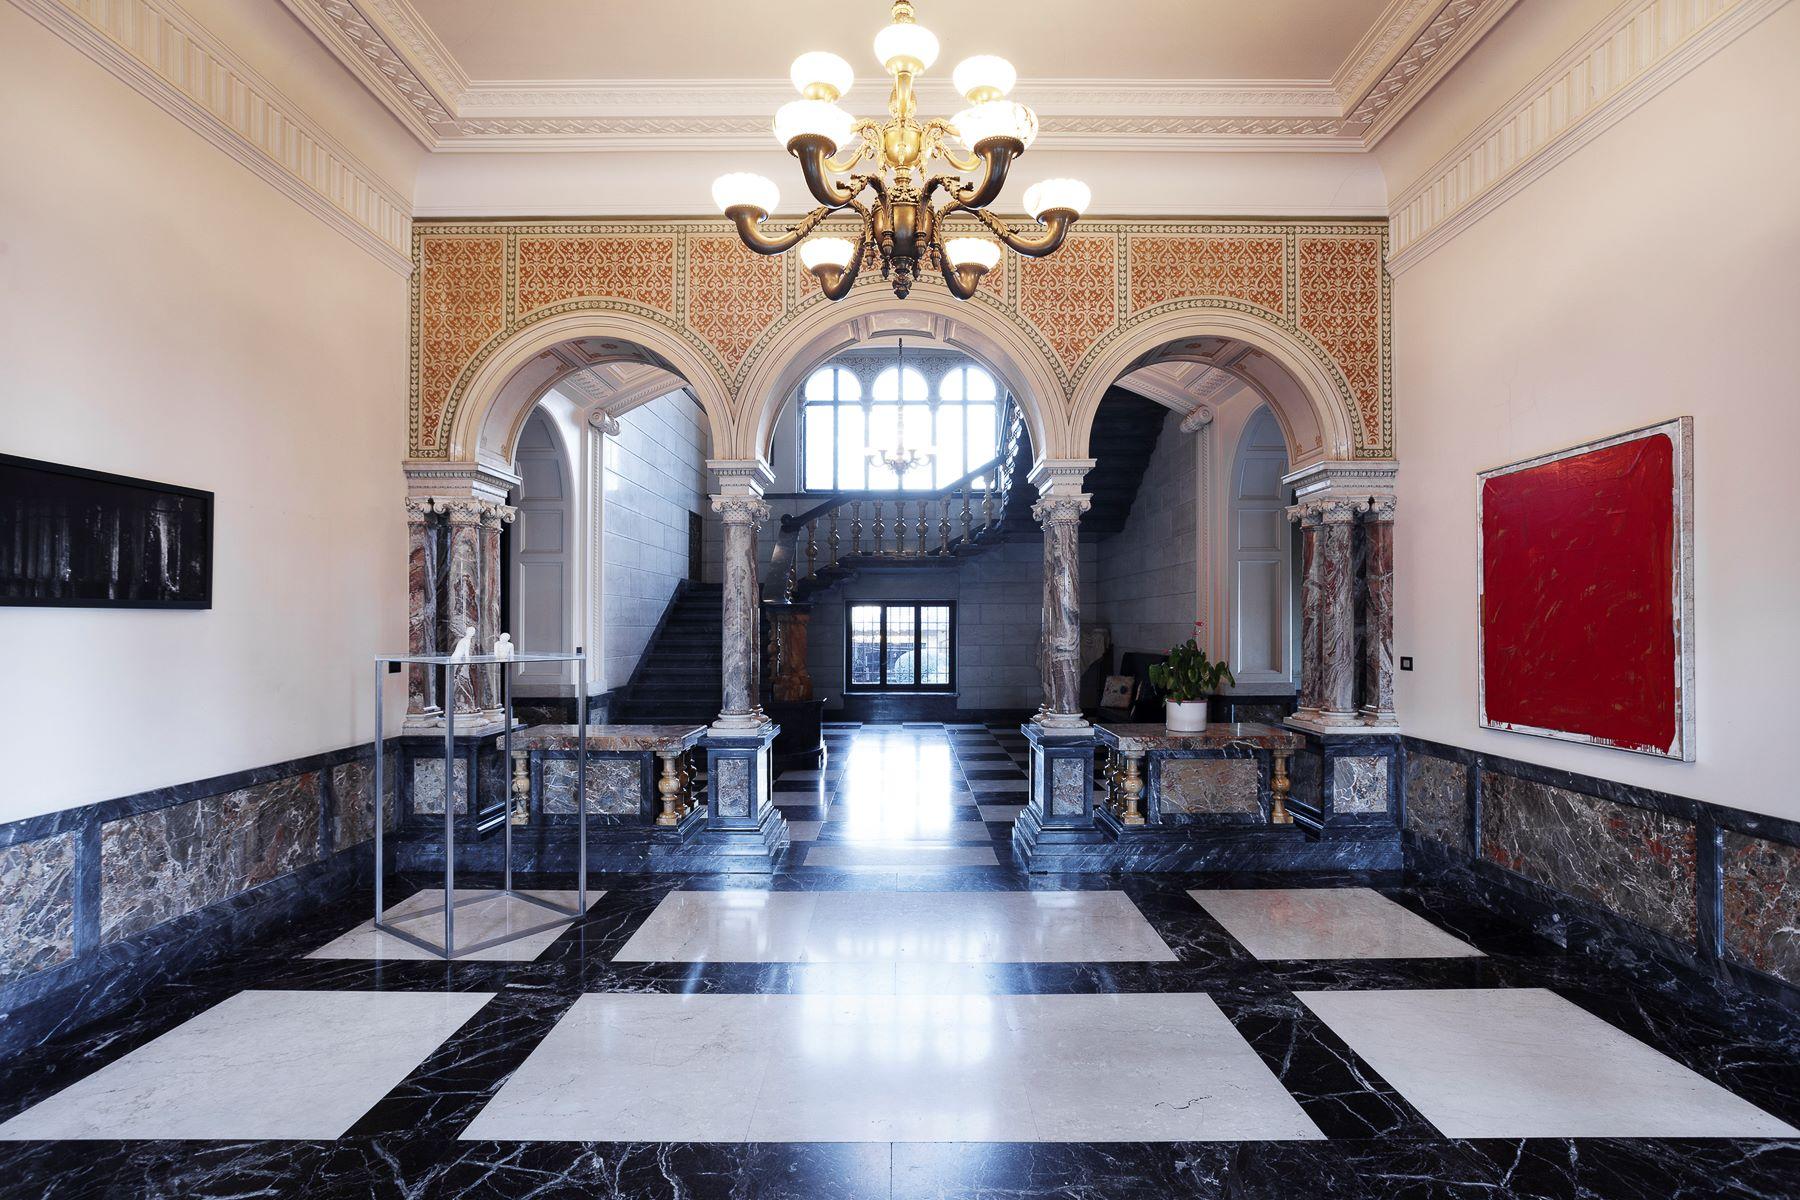 Additional photo for property listing at Beau Villa en style Liberty Via Galileo Galilei, 45 Biella, Biella 15900 Italie